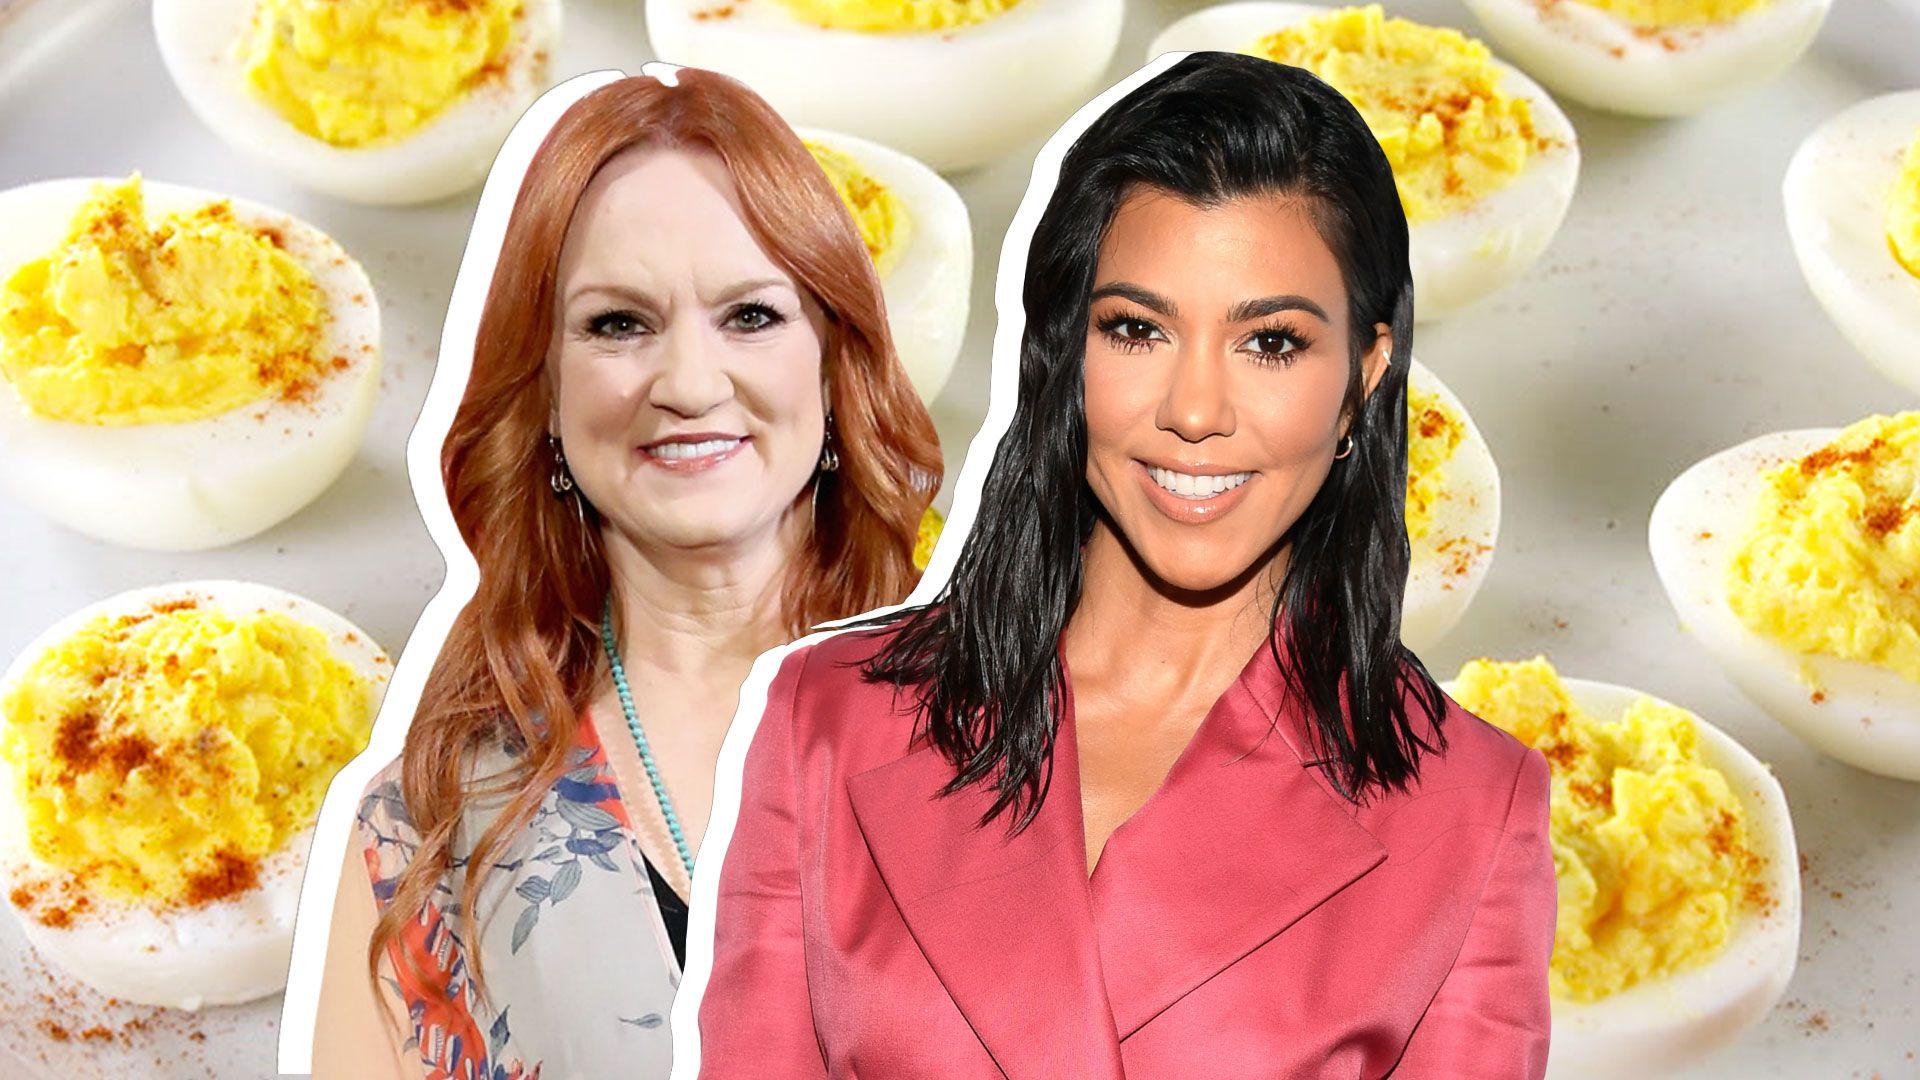 Kourtney Kardashian Vs. Ree Drummond: Whose Deviled Eggs Are Better?